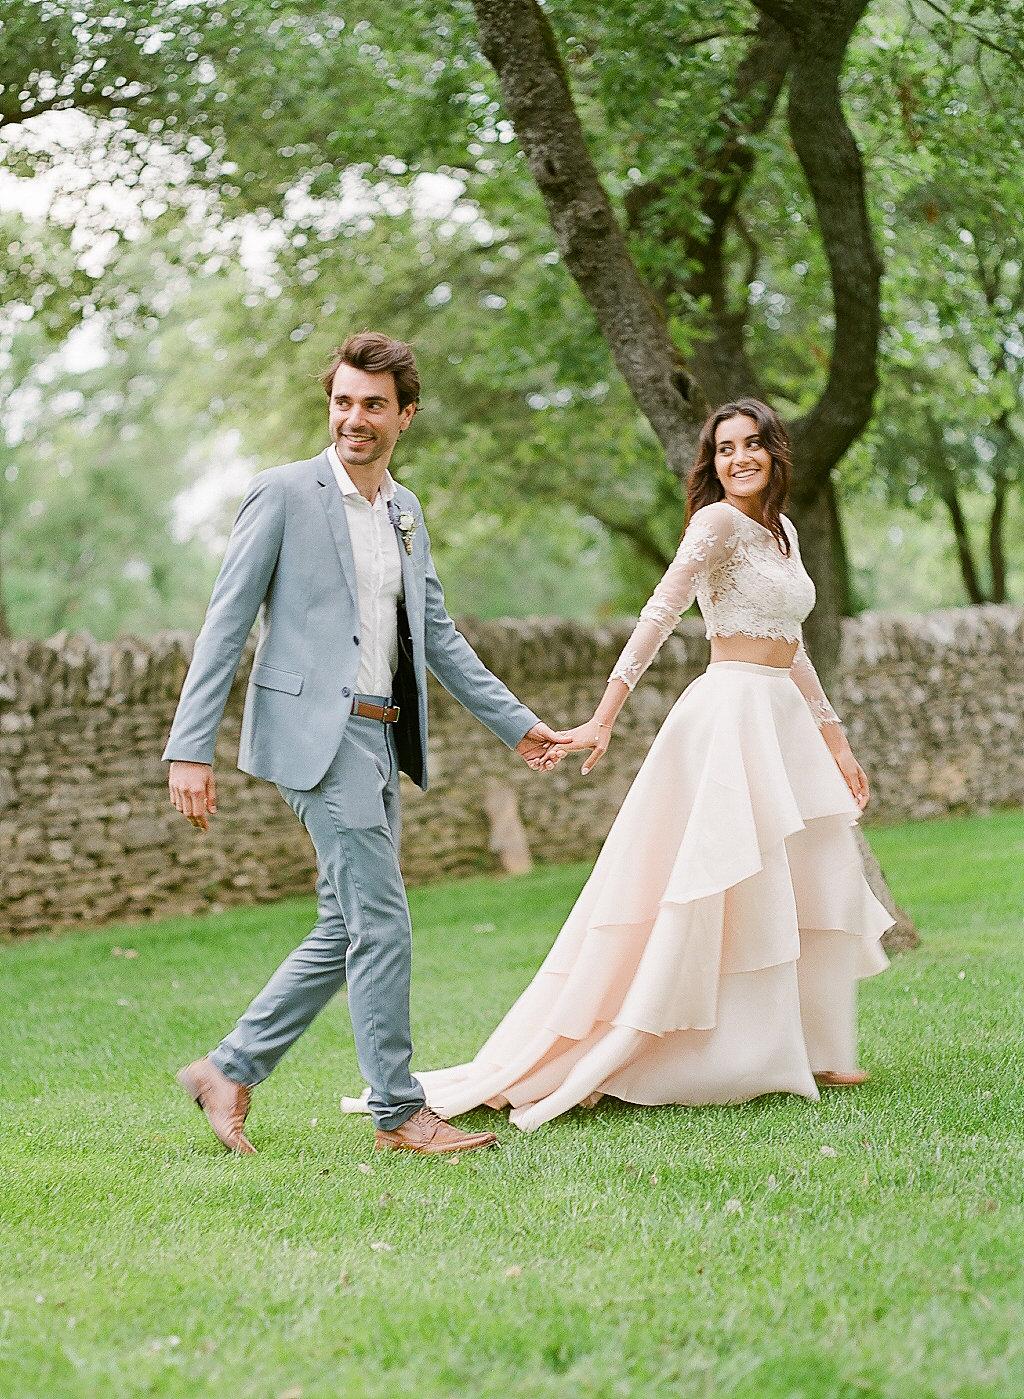 le coeur dans les etoiles - wedding planner - provence - luberon - alpilles - drome - vaucluse - sardaigne - italie - organisation - mariage - shooting - dolce vita - valery villard-384